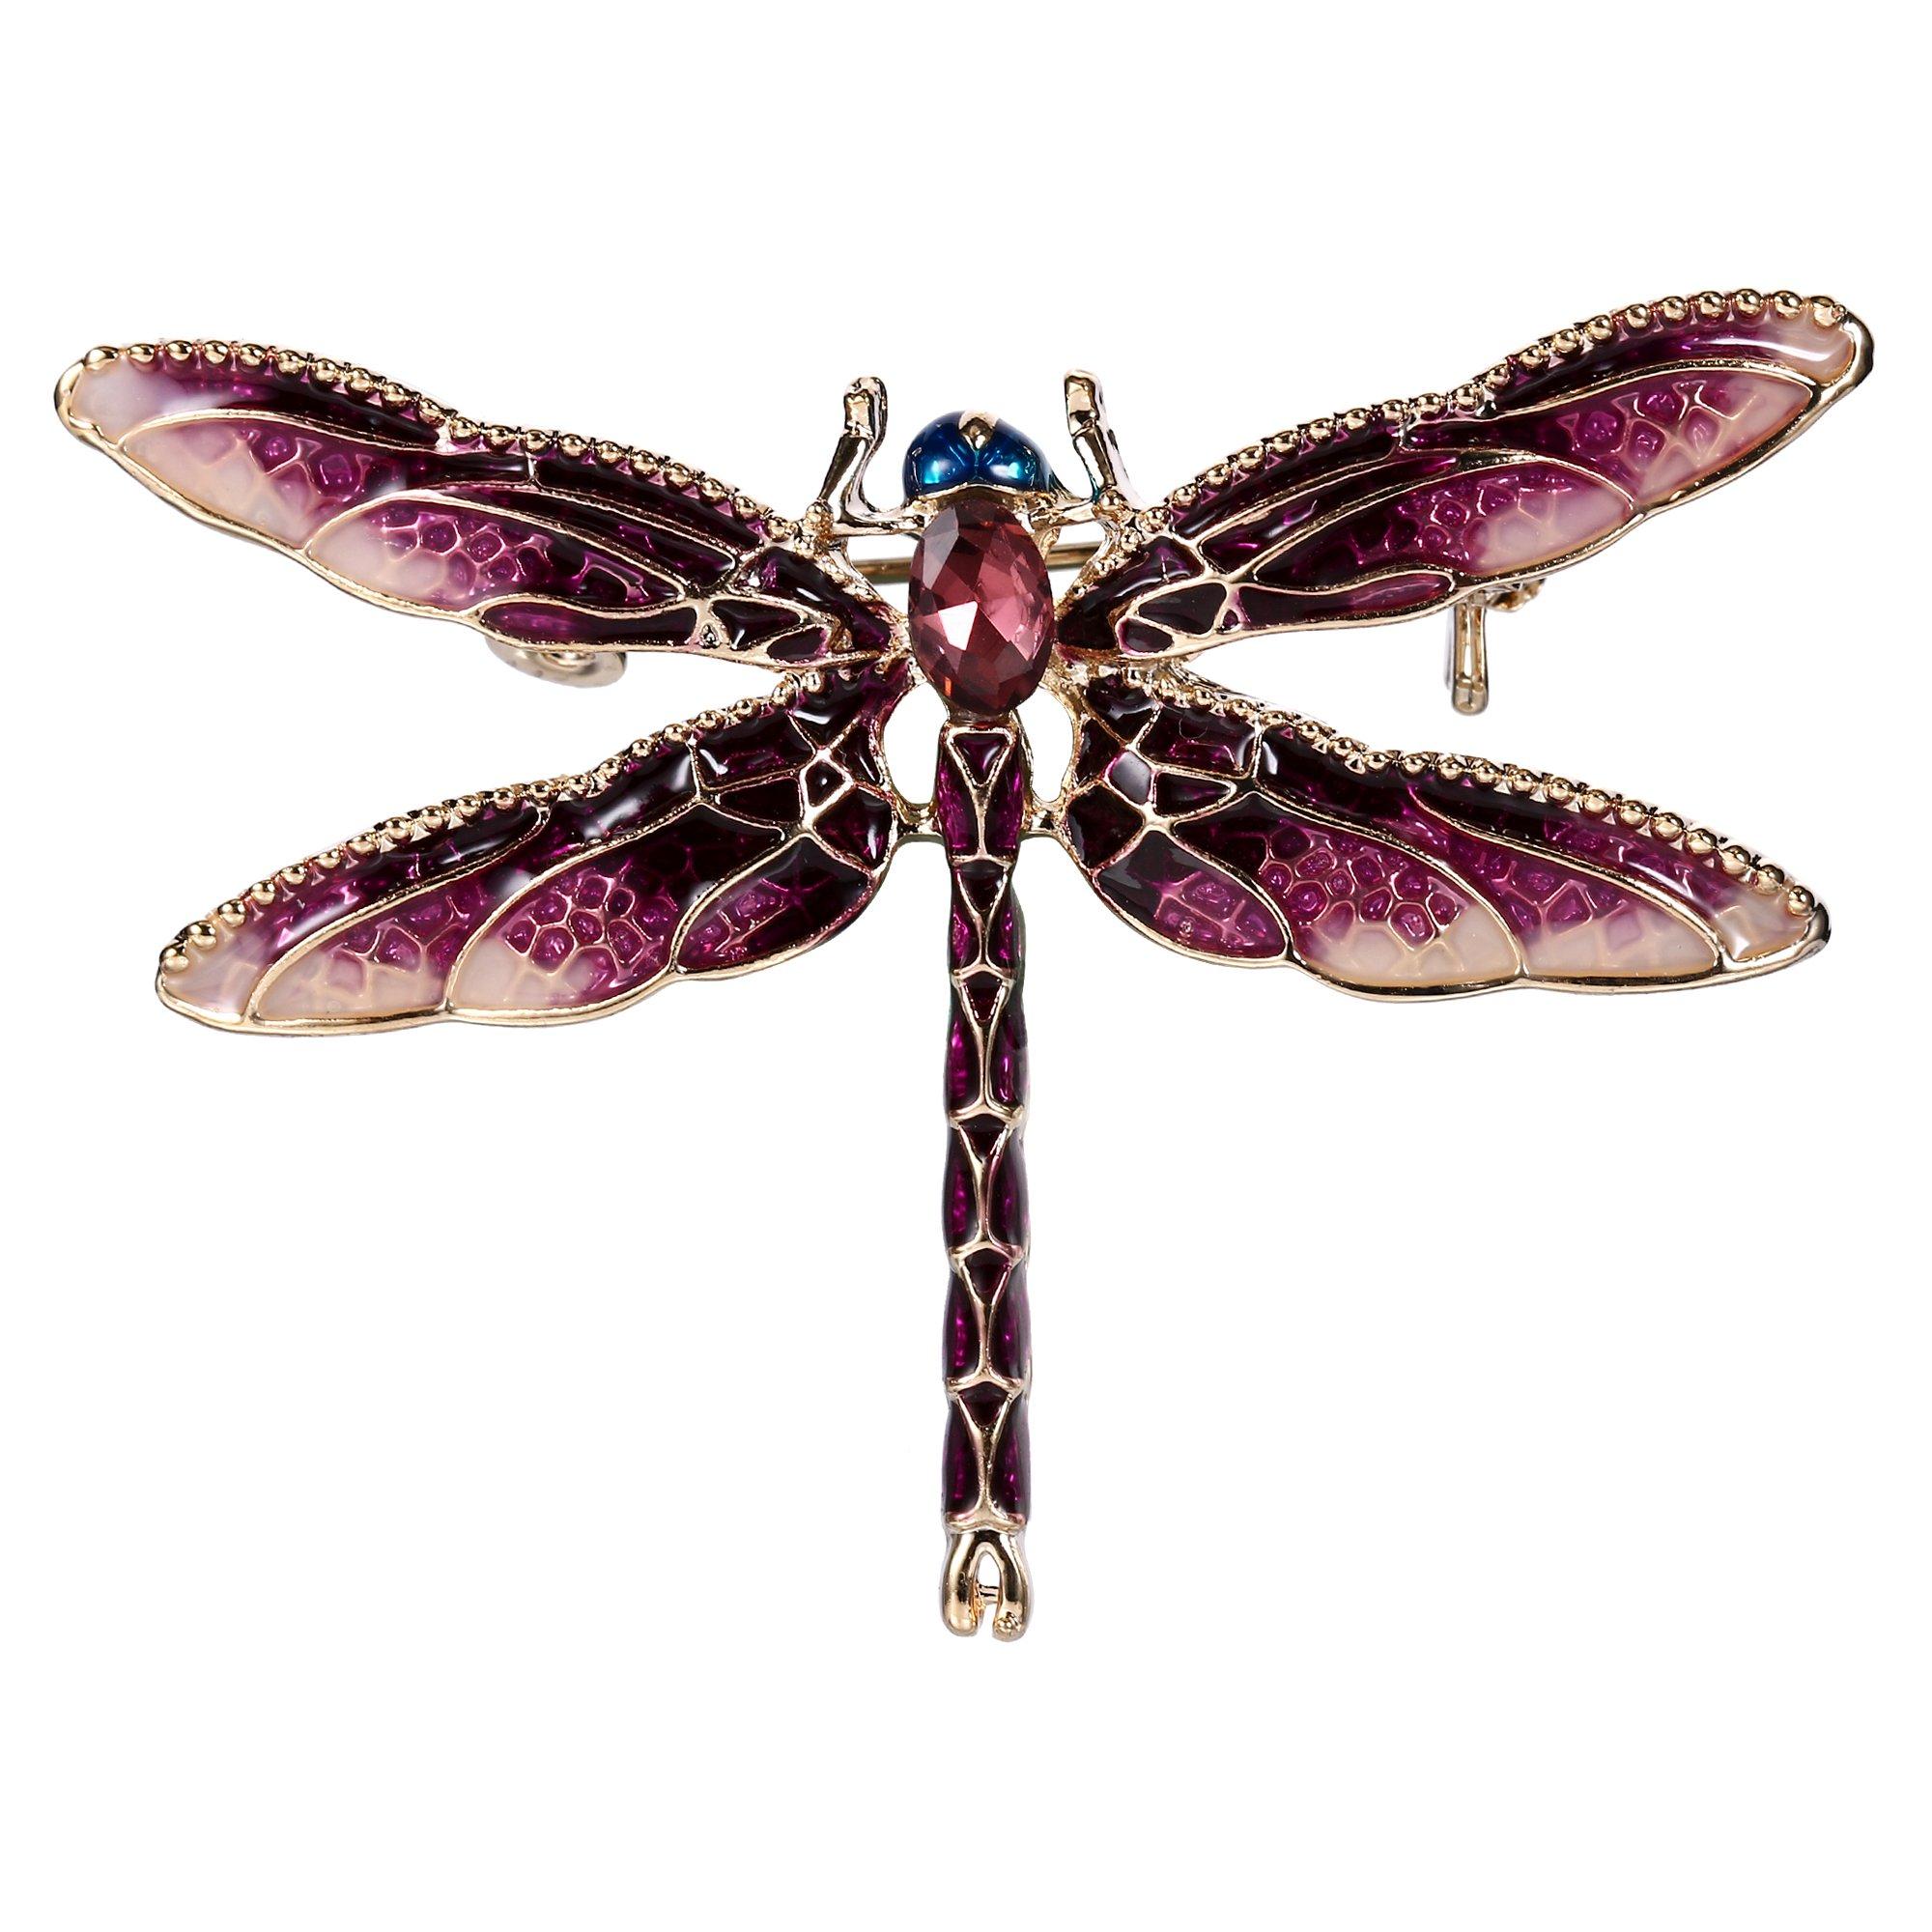 EVER FAITH Women's Austrian Crystal Purple Enamel Cute Animal Dragonfly Brooch Gold-Tone